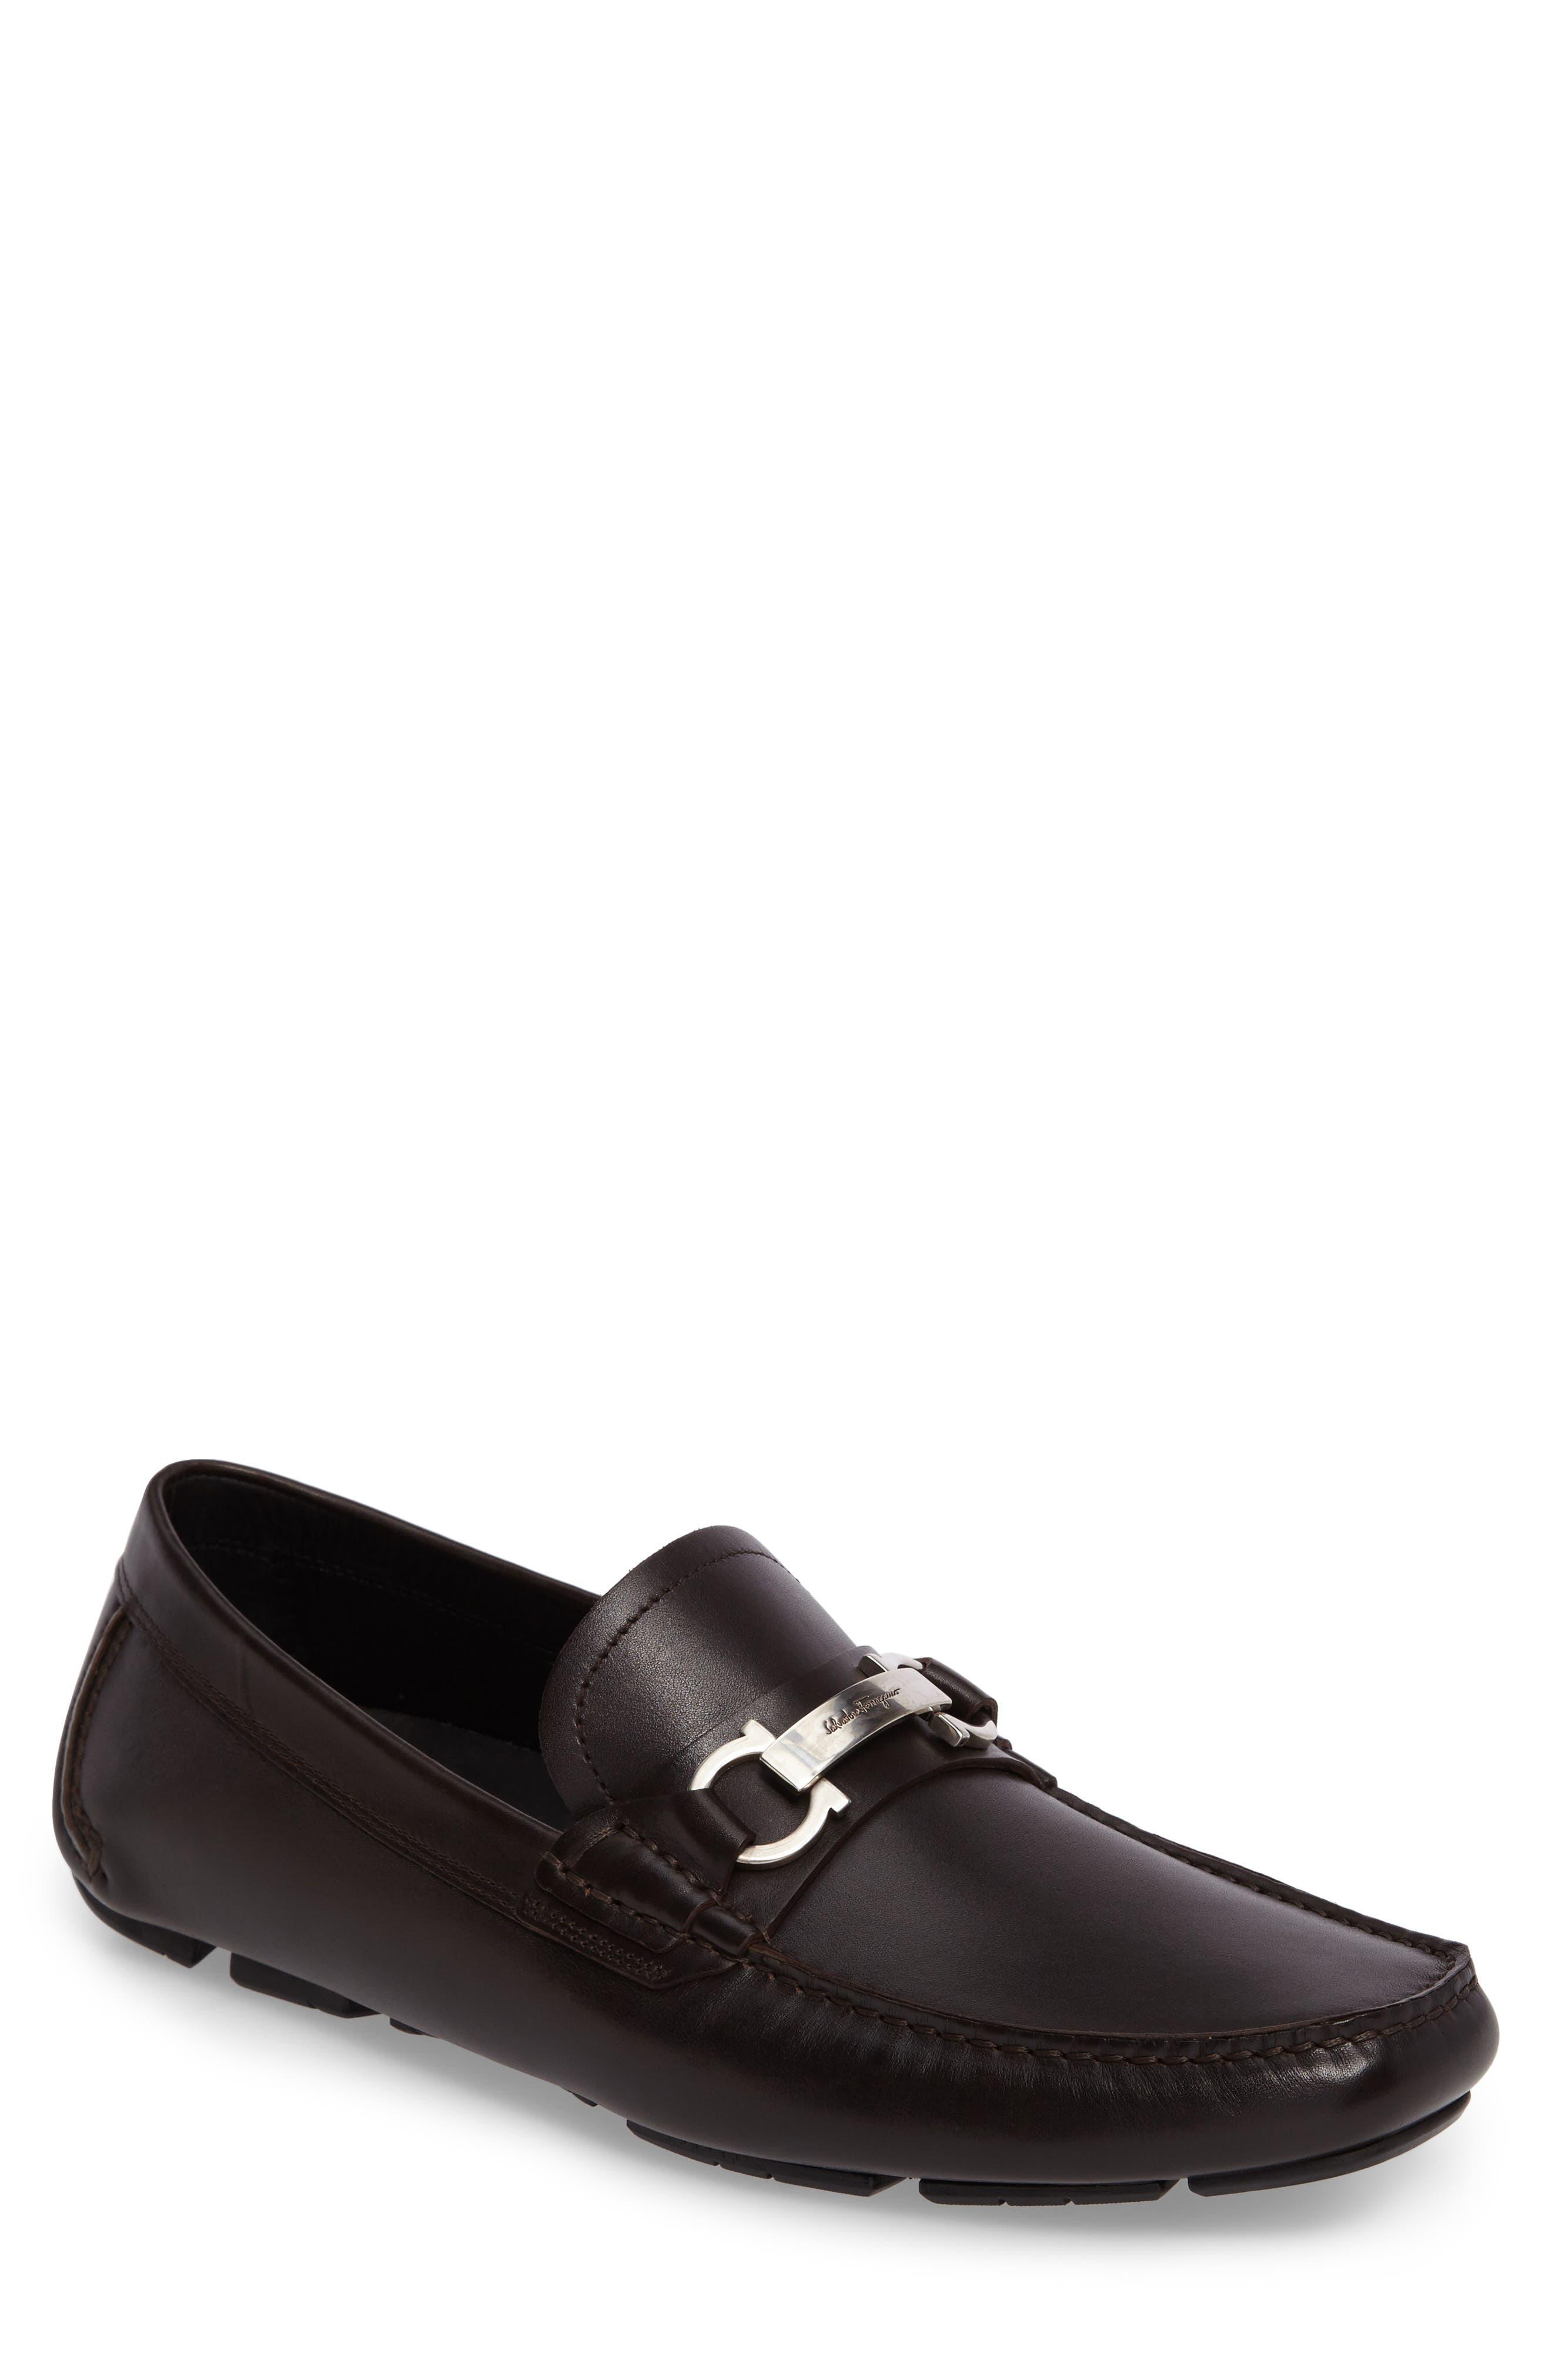 Alternate Image 1 Selected - Salvatore Ferragamo Driving Shoe (Men)